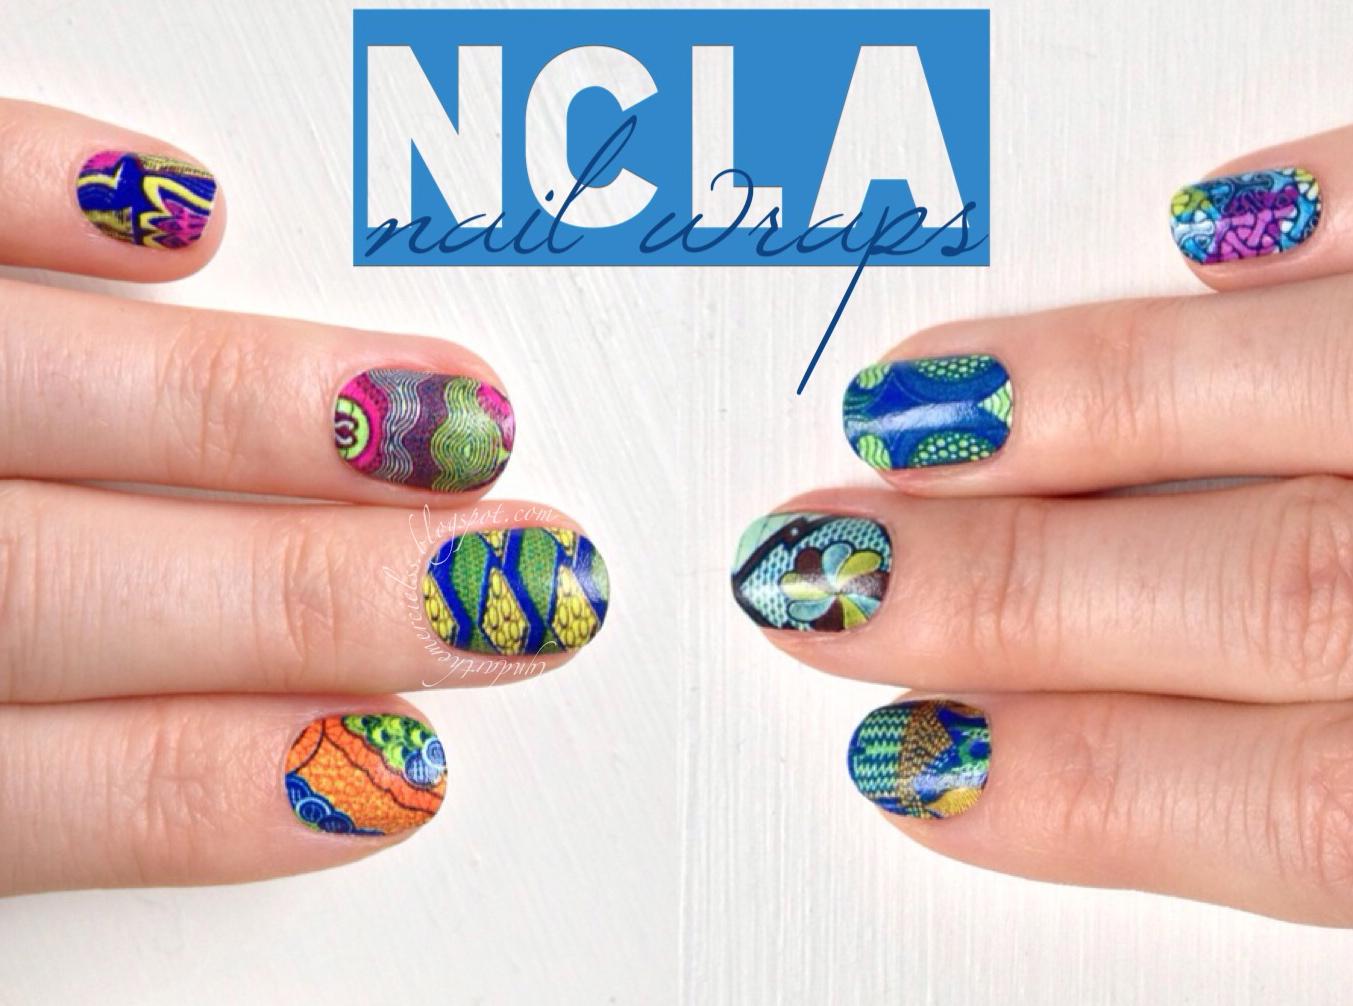 Lyndar the Merciless: Pretty in Print: NCLA Nail Wraps review